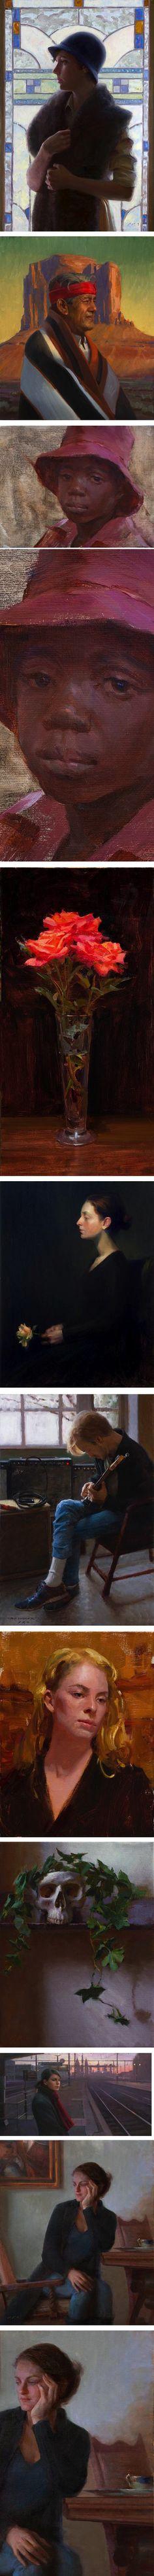 Tony Pro, portrait, figurative and still life painting